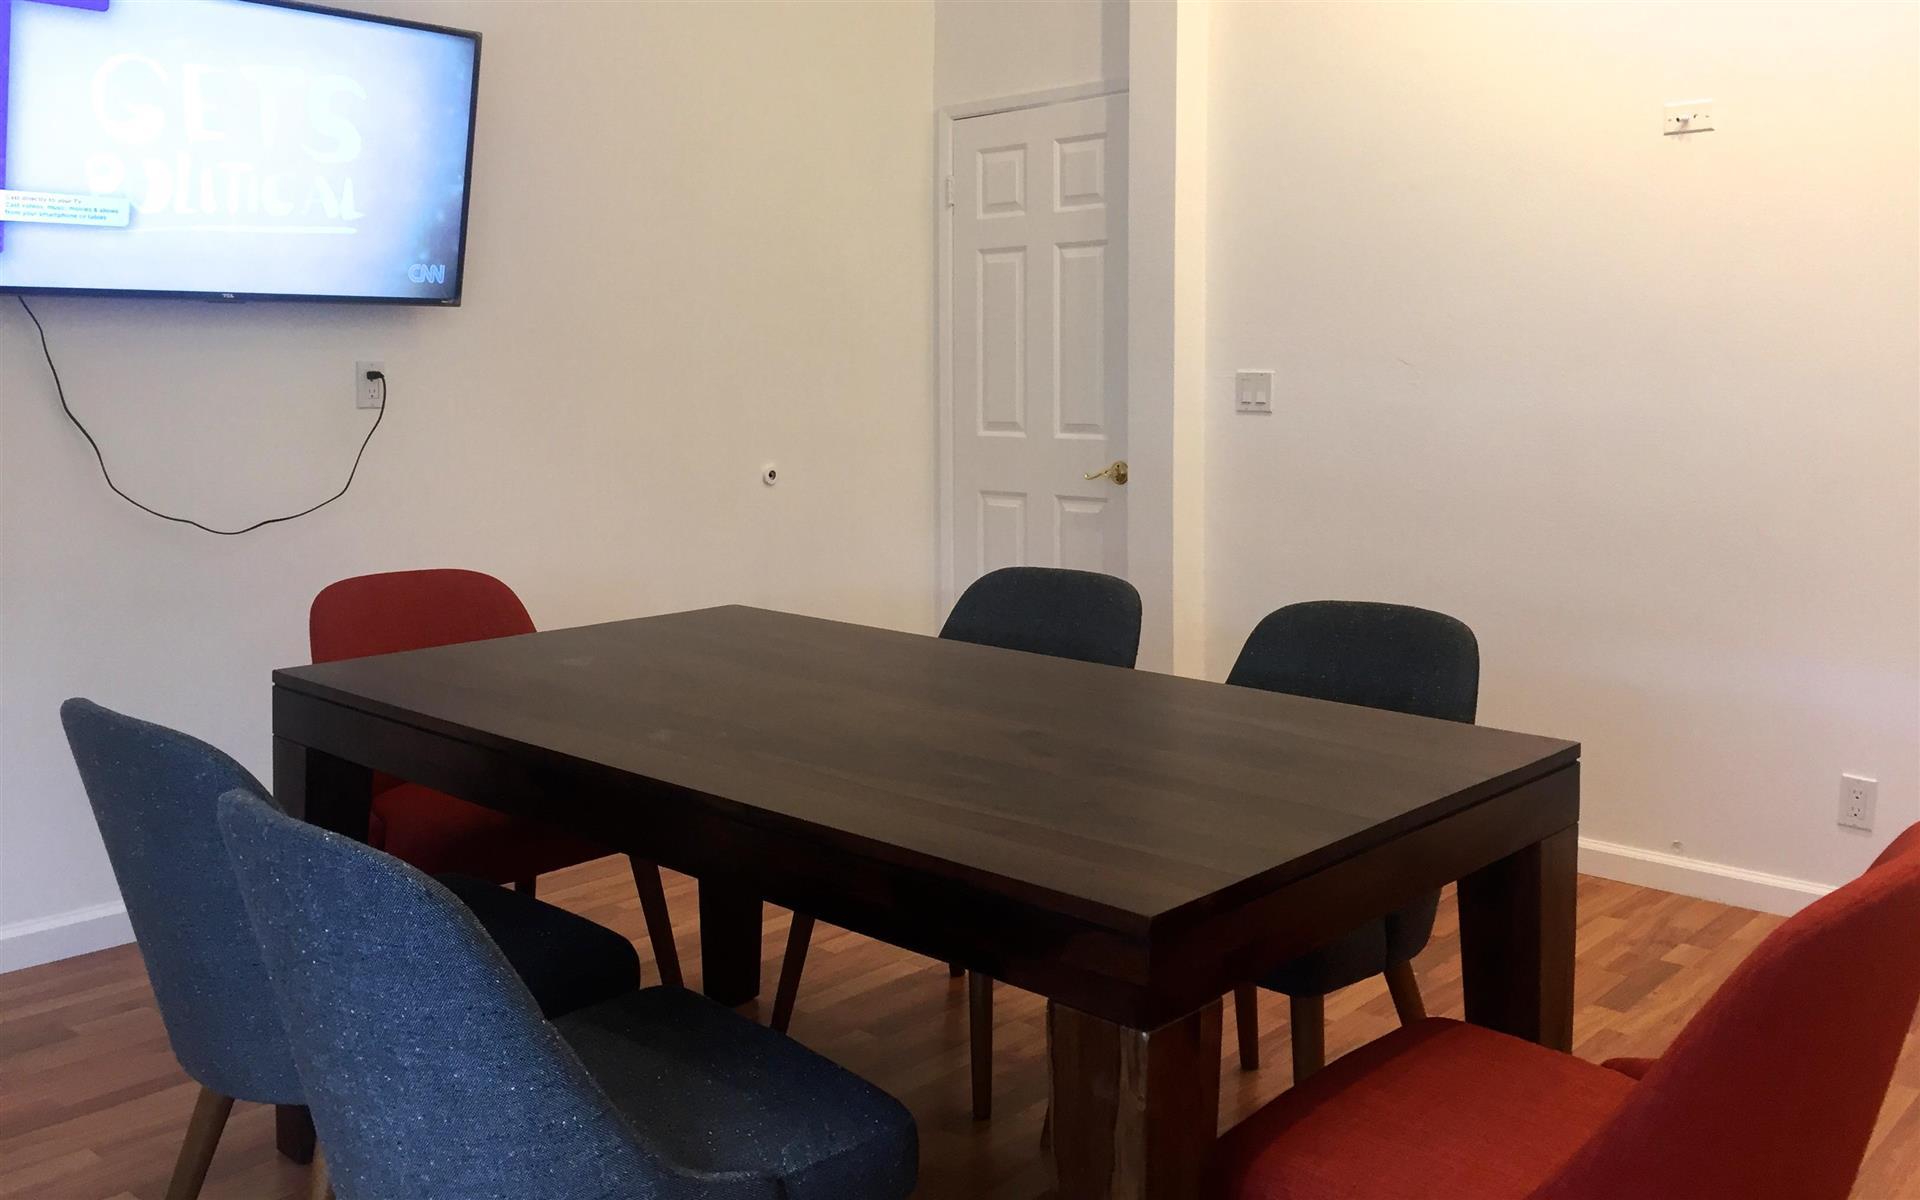 OnePiece Work - Borad Room next to Santana Row